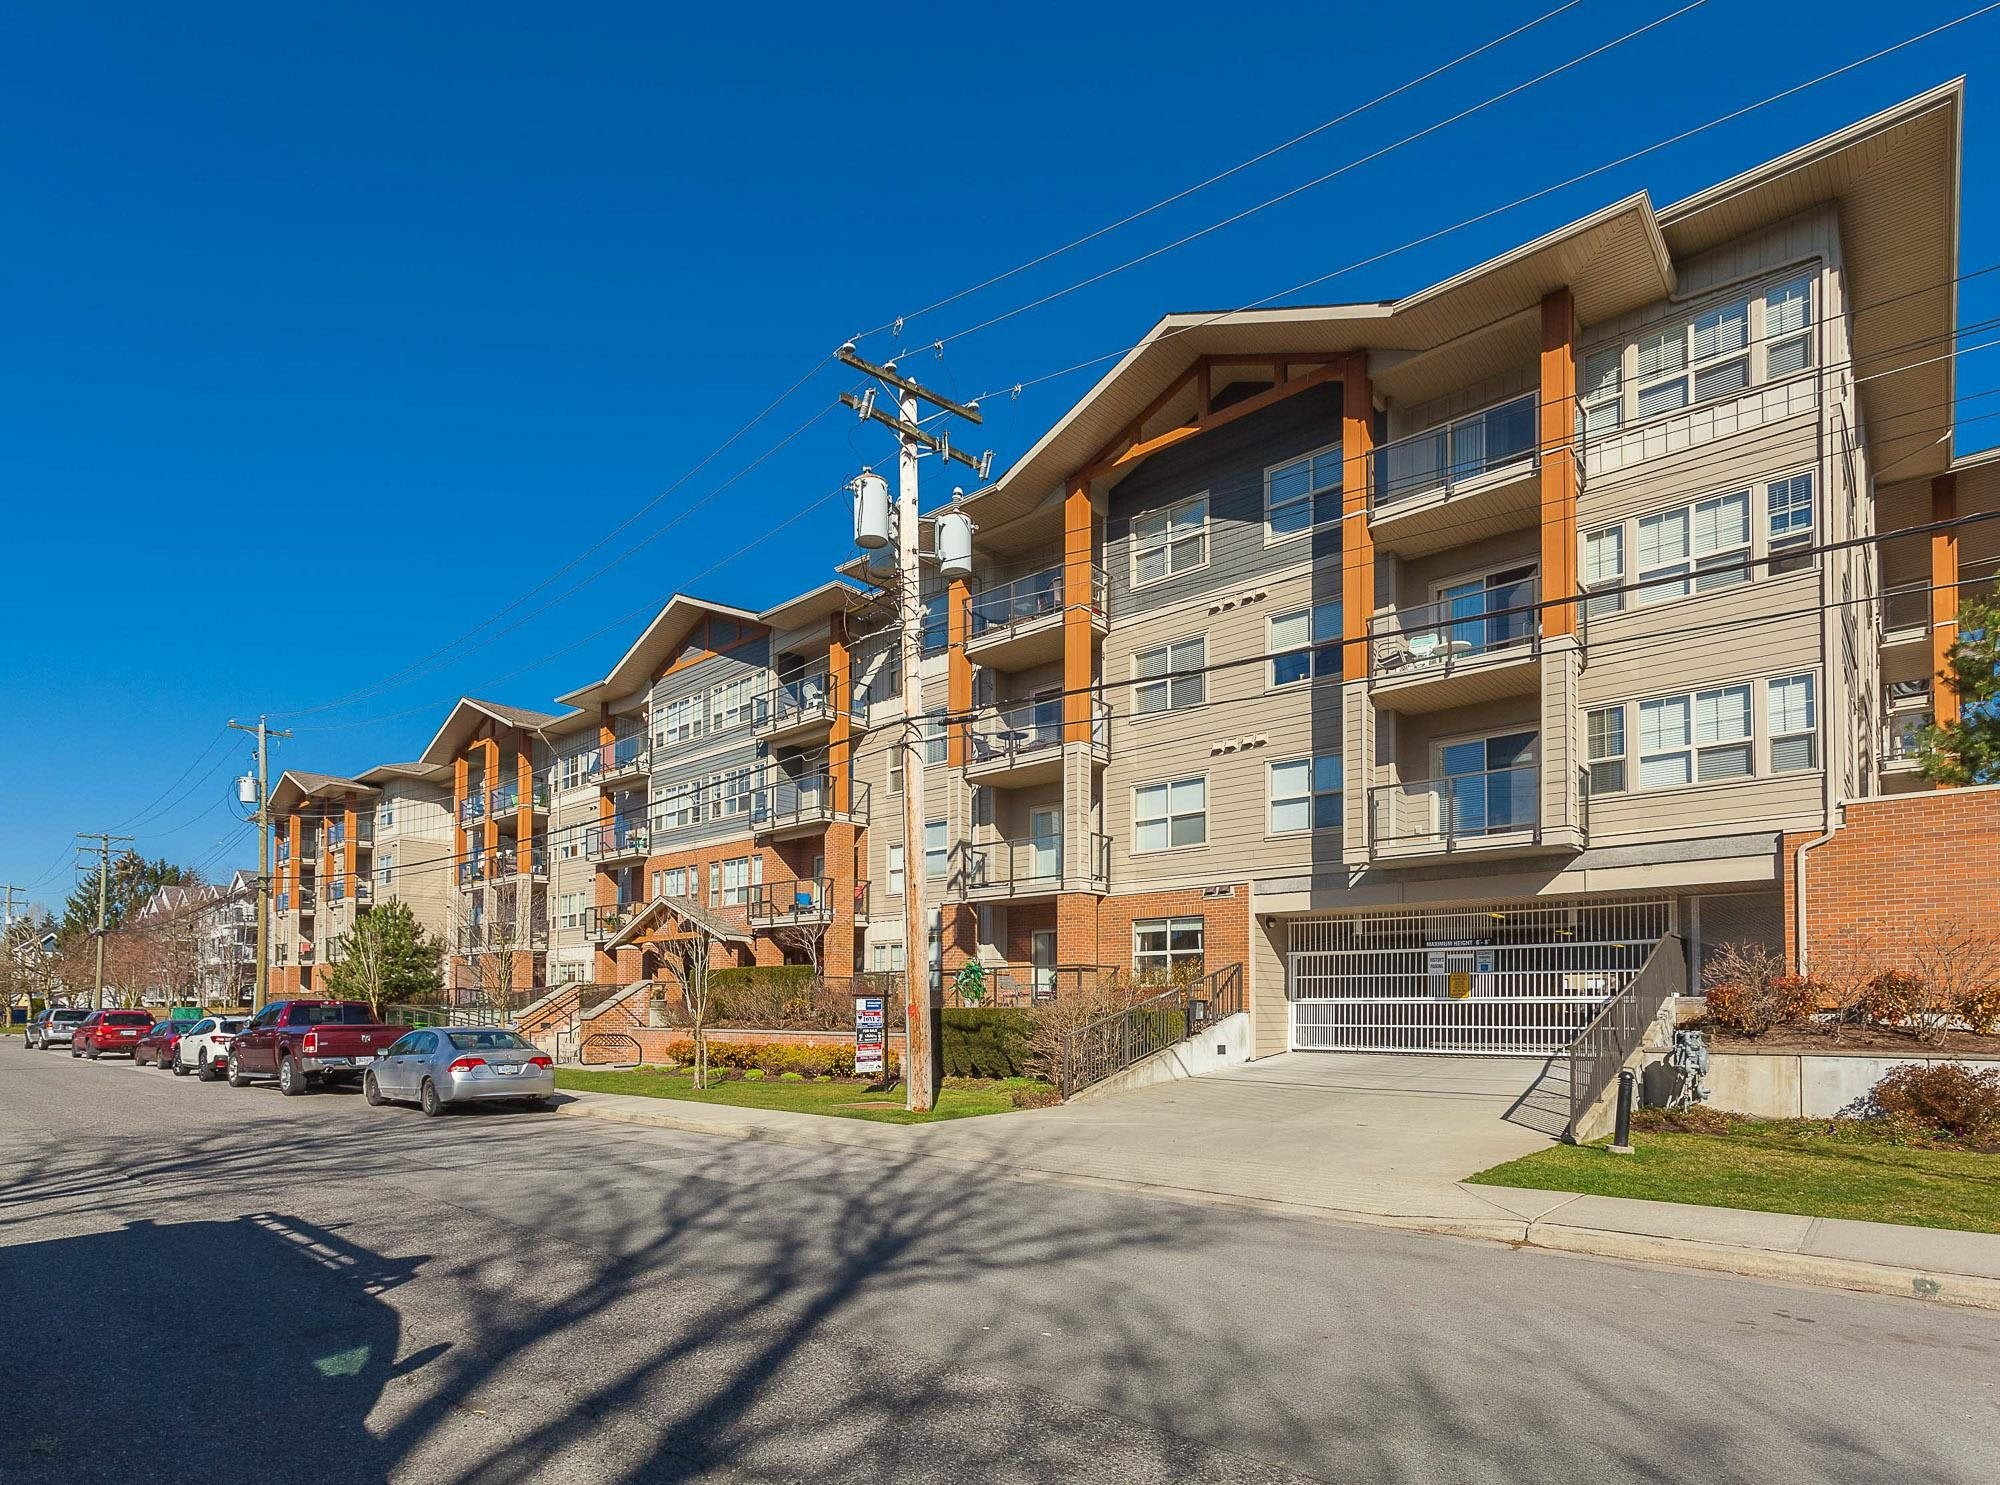 114 20219 54A AVENUE - Langley City Apartment/Condo for sale, 1 Bedroom (R2616172) - #2